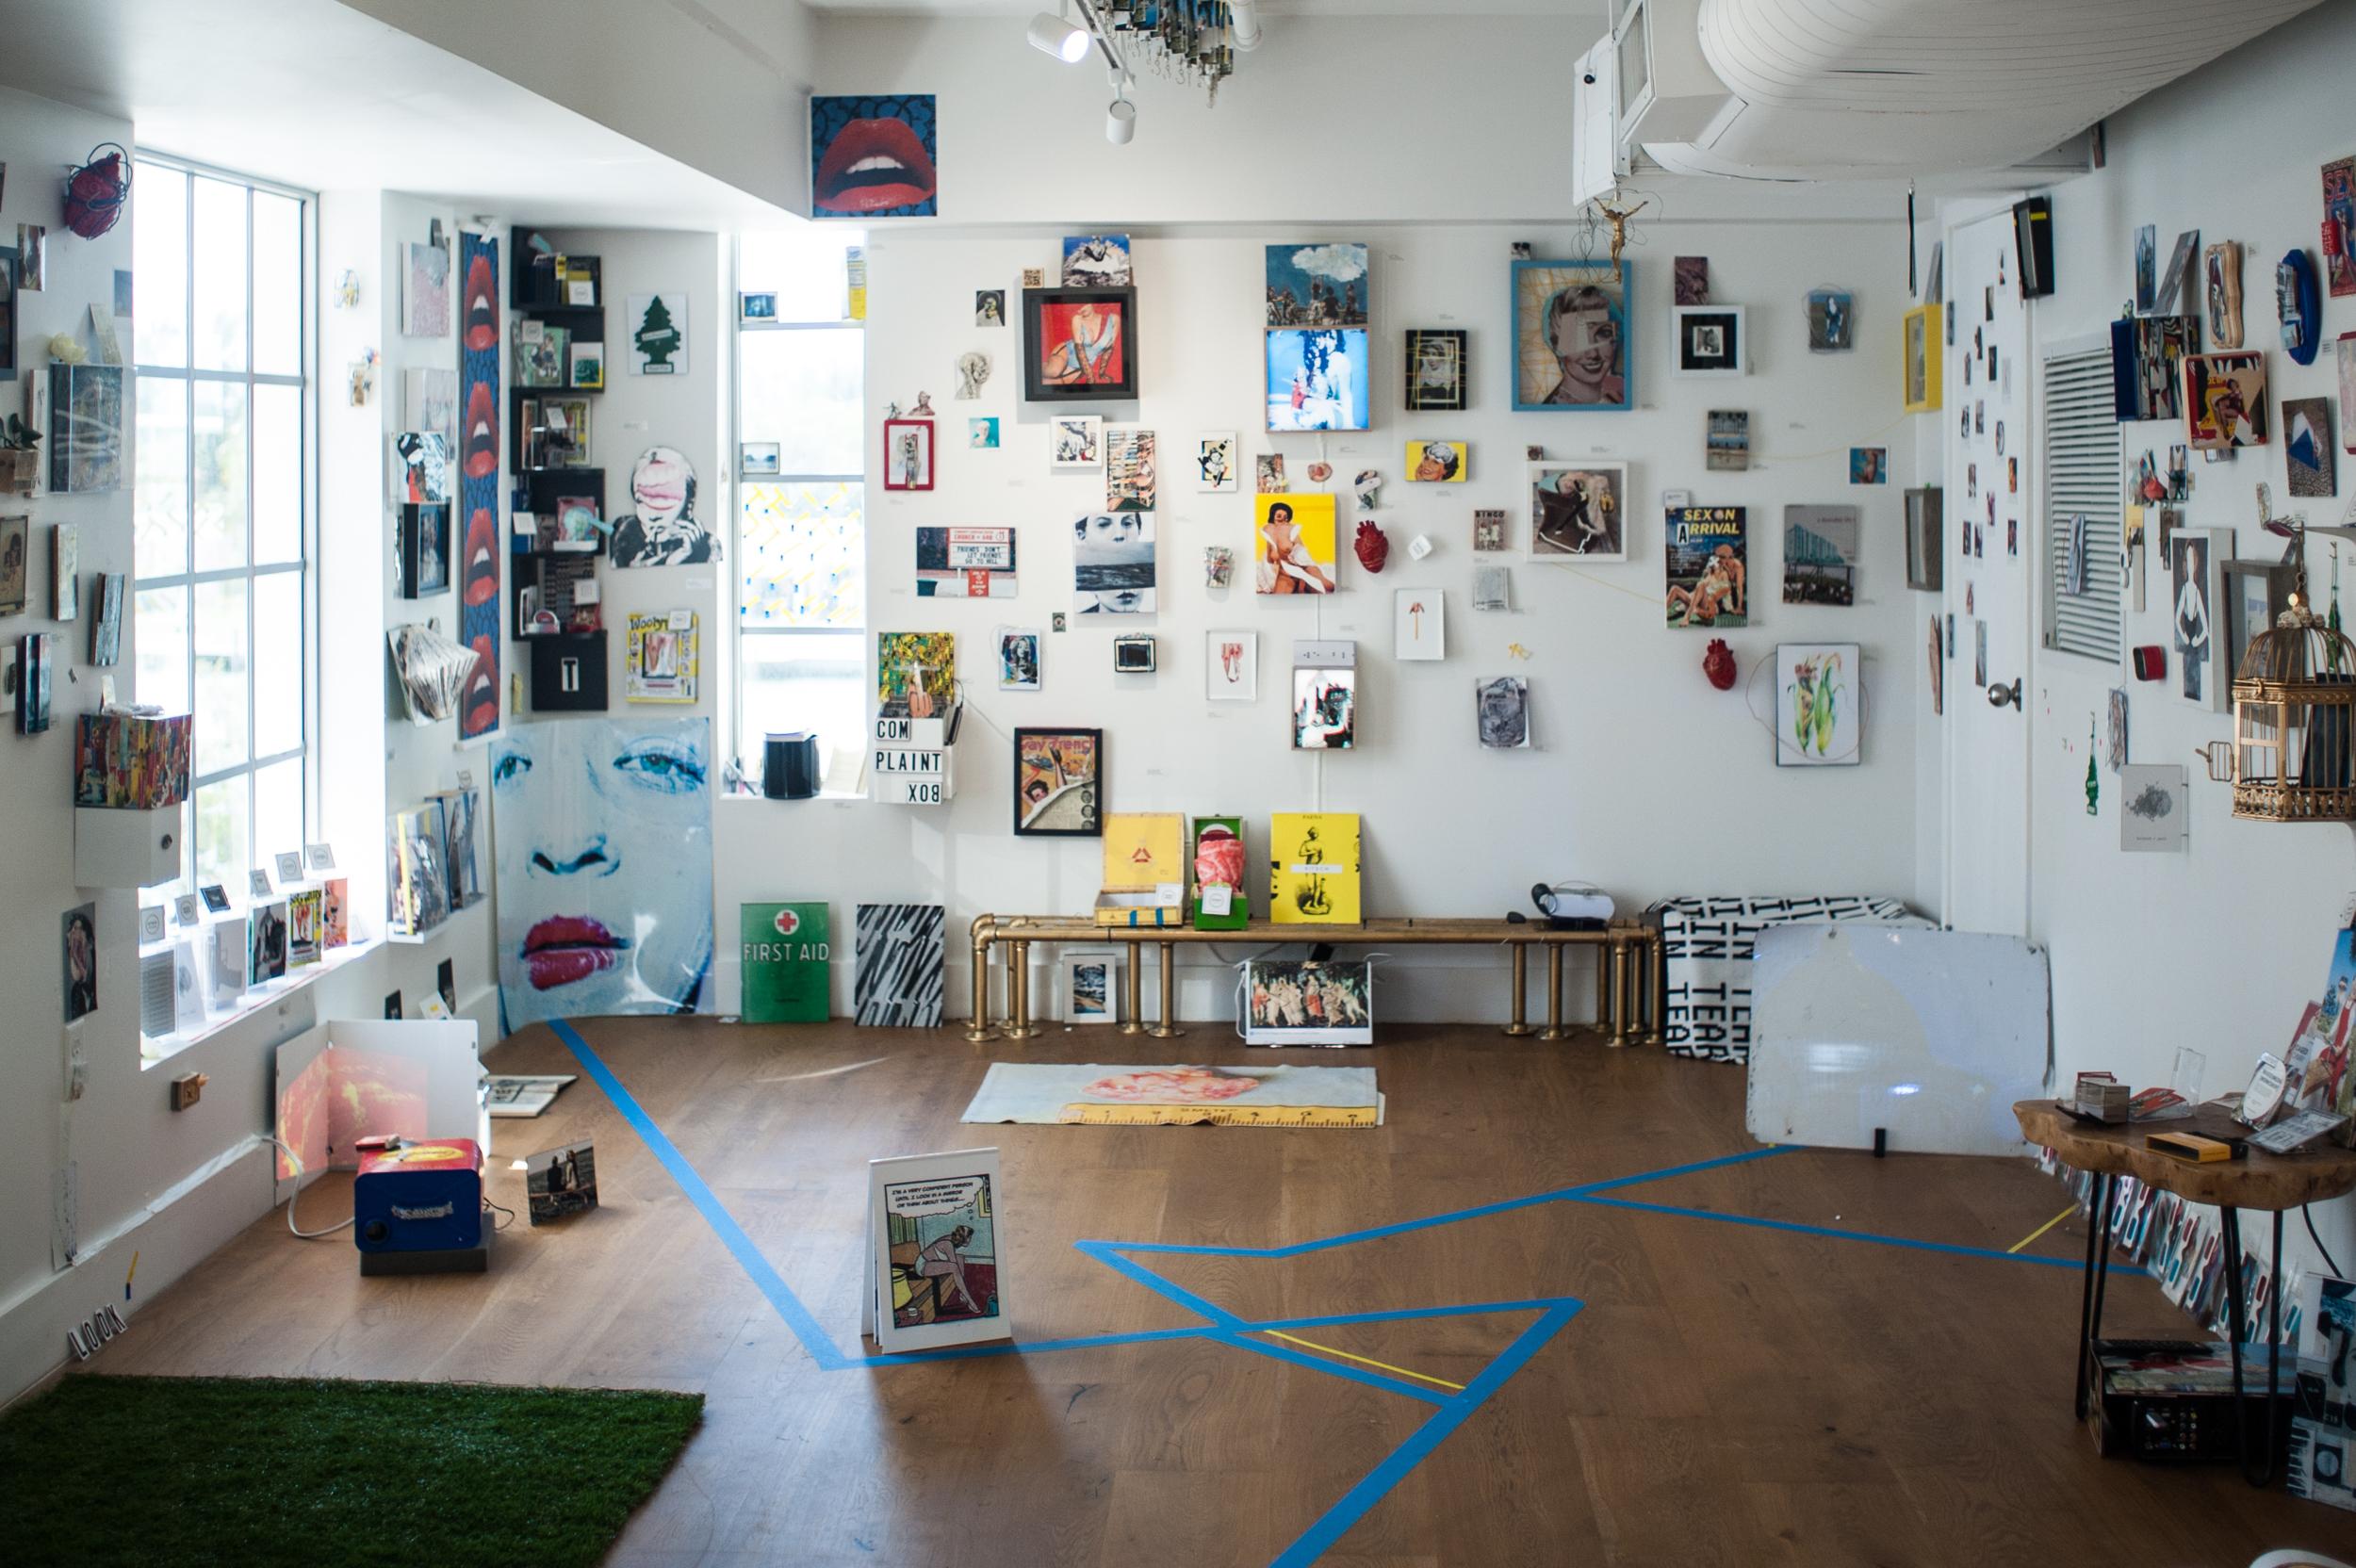 Faena-Exhibition-Images-54.jpg